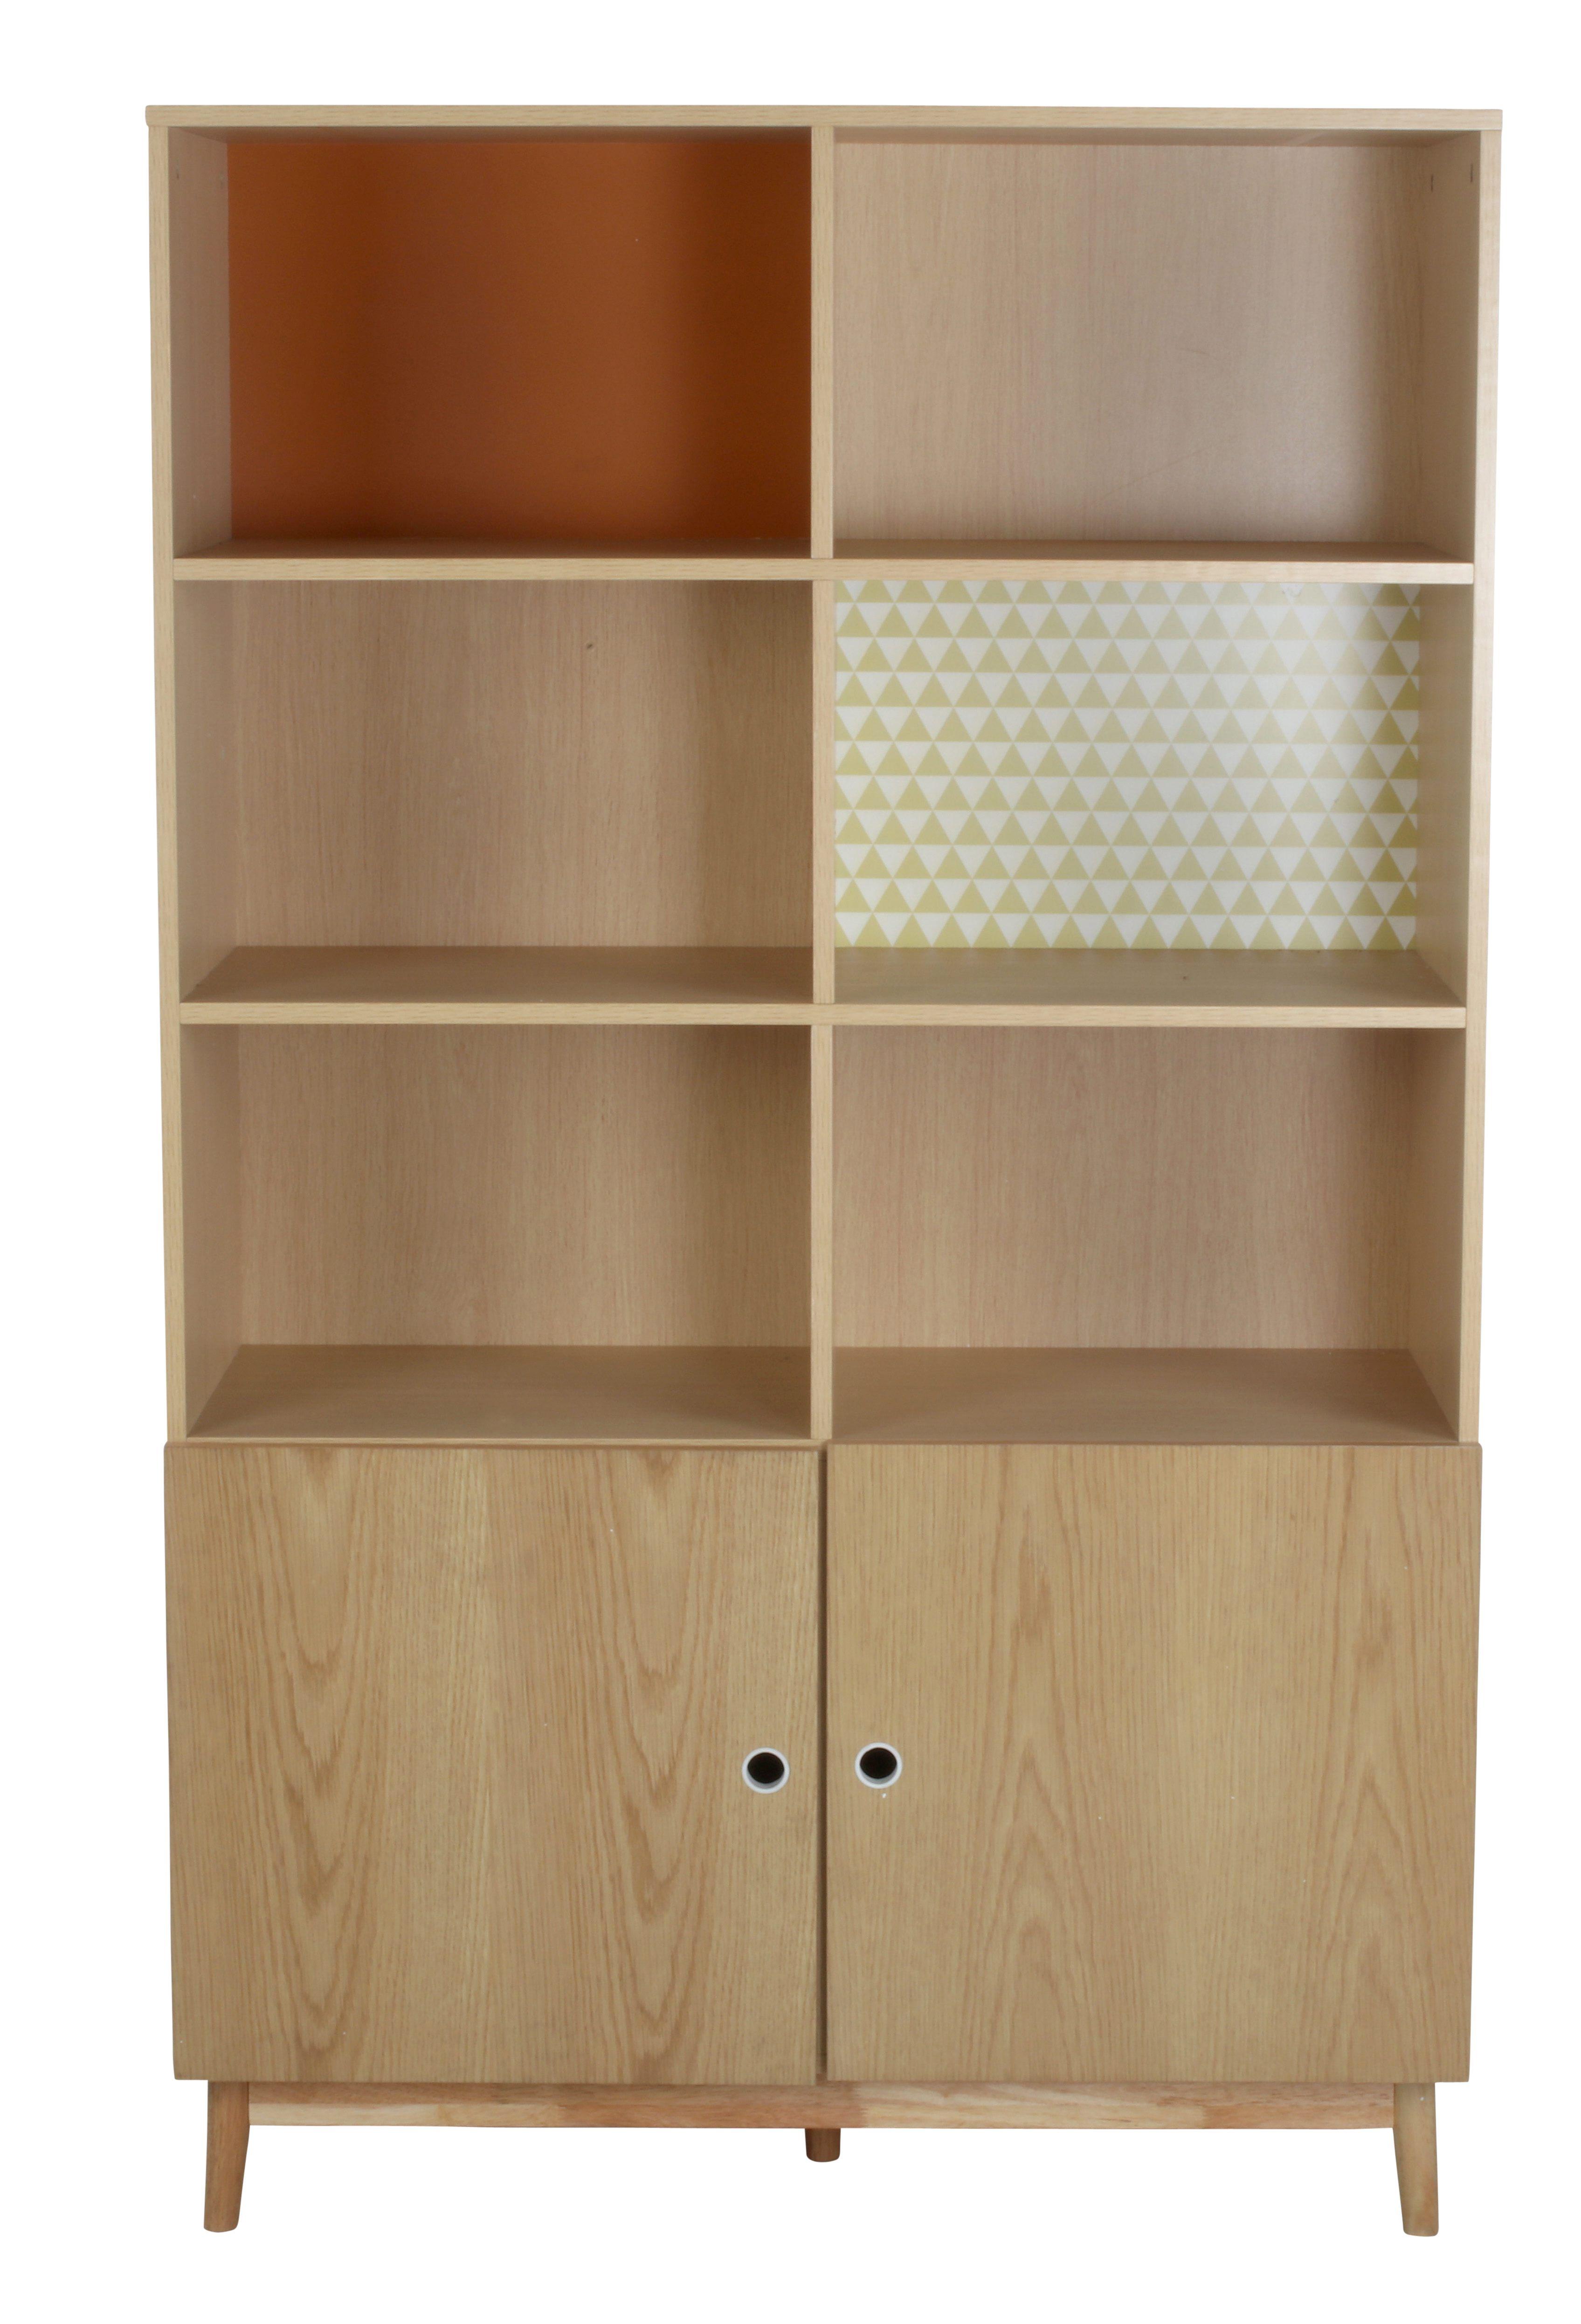 Buffet Haut 2 Portes Floden Chene Imprime Furniture Catalog Furniture Design Sofa Design